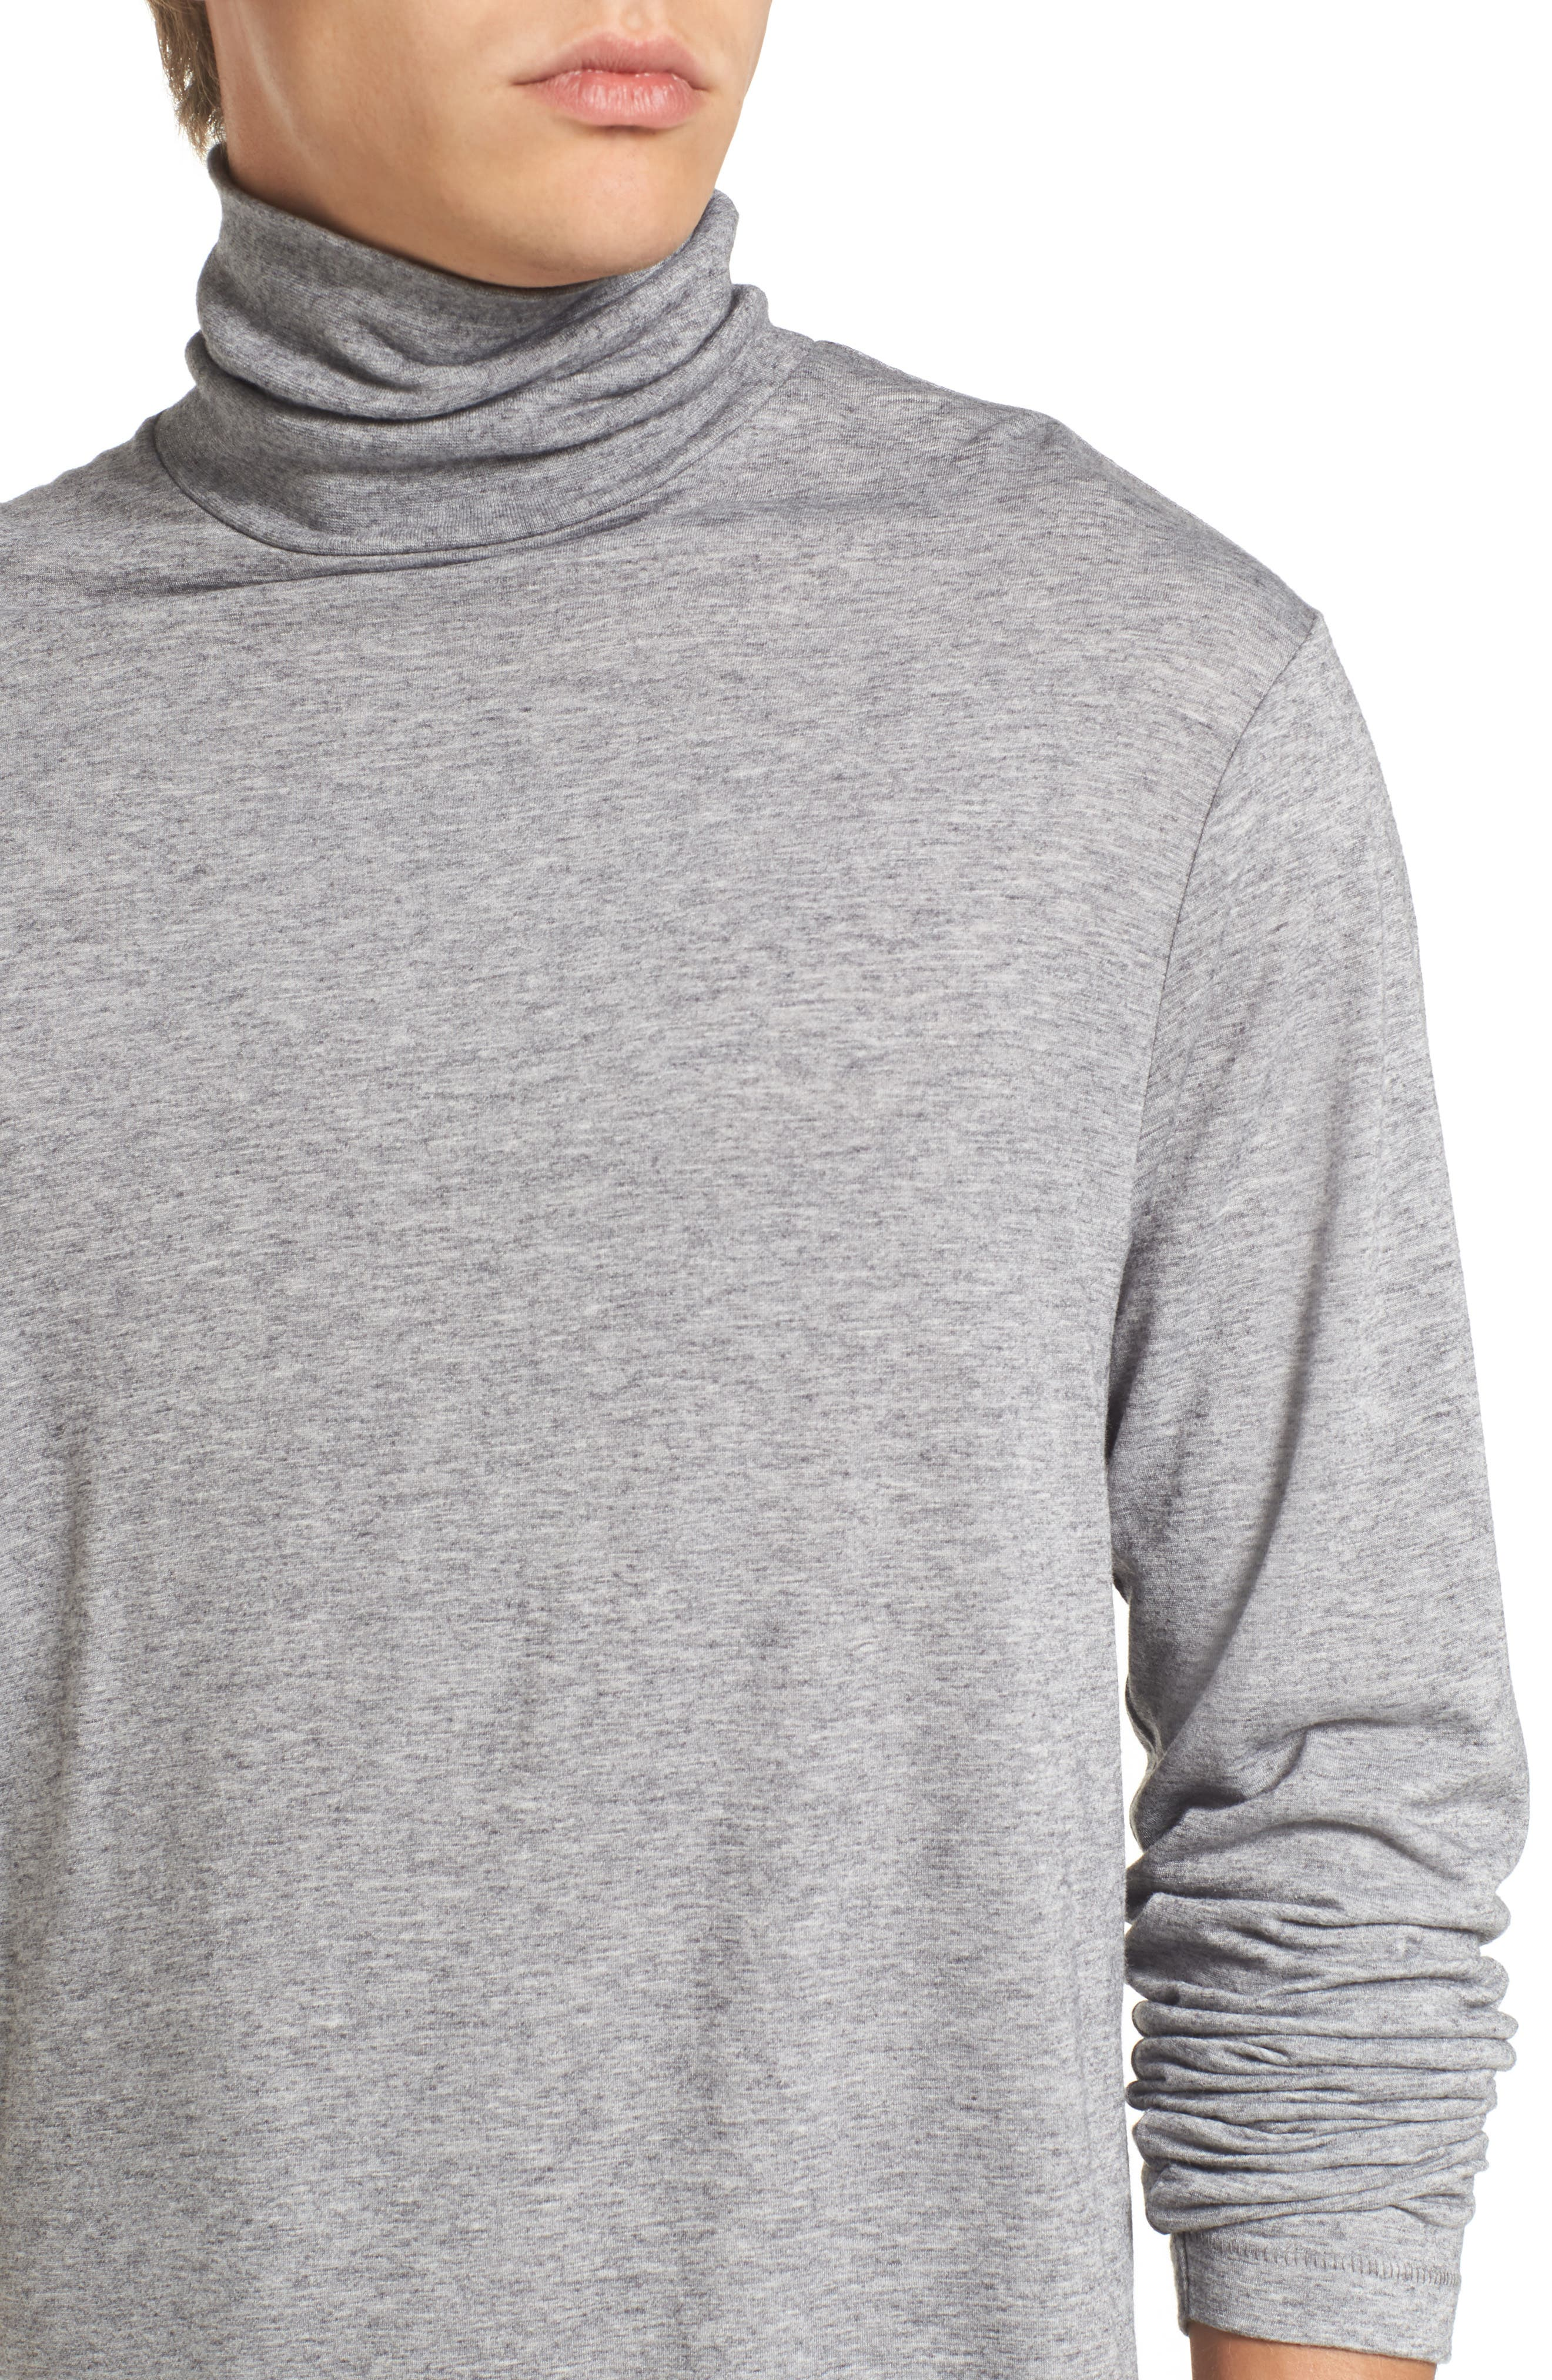 Lightweight Turtleneck Sweater,                             Alternate thumbnail 4, color,                             Grey Melange